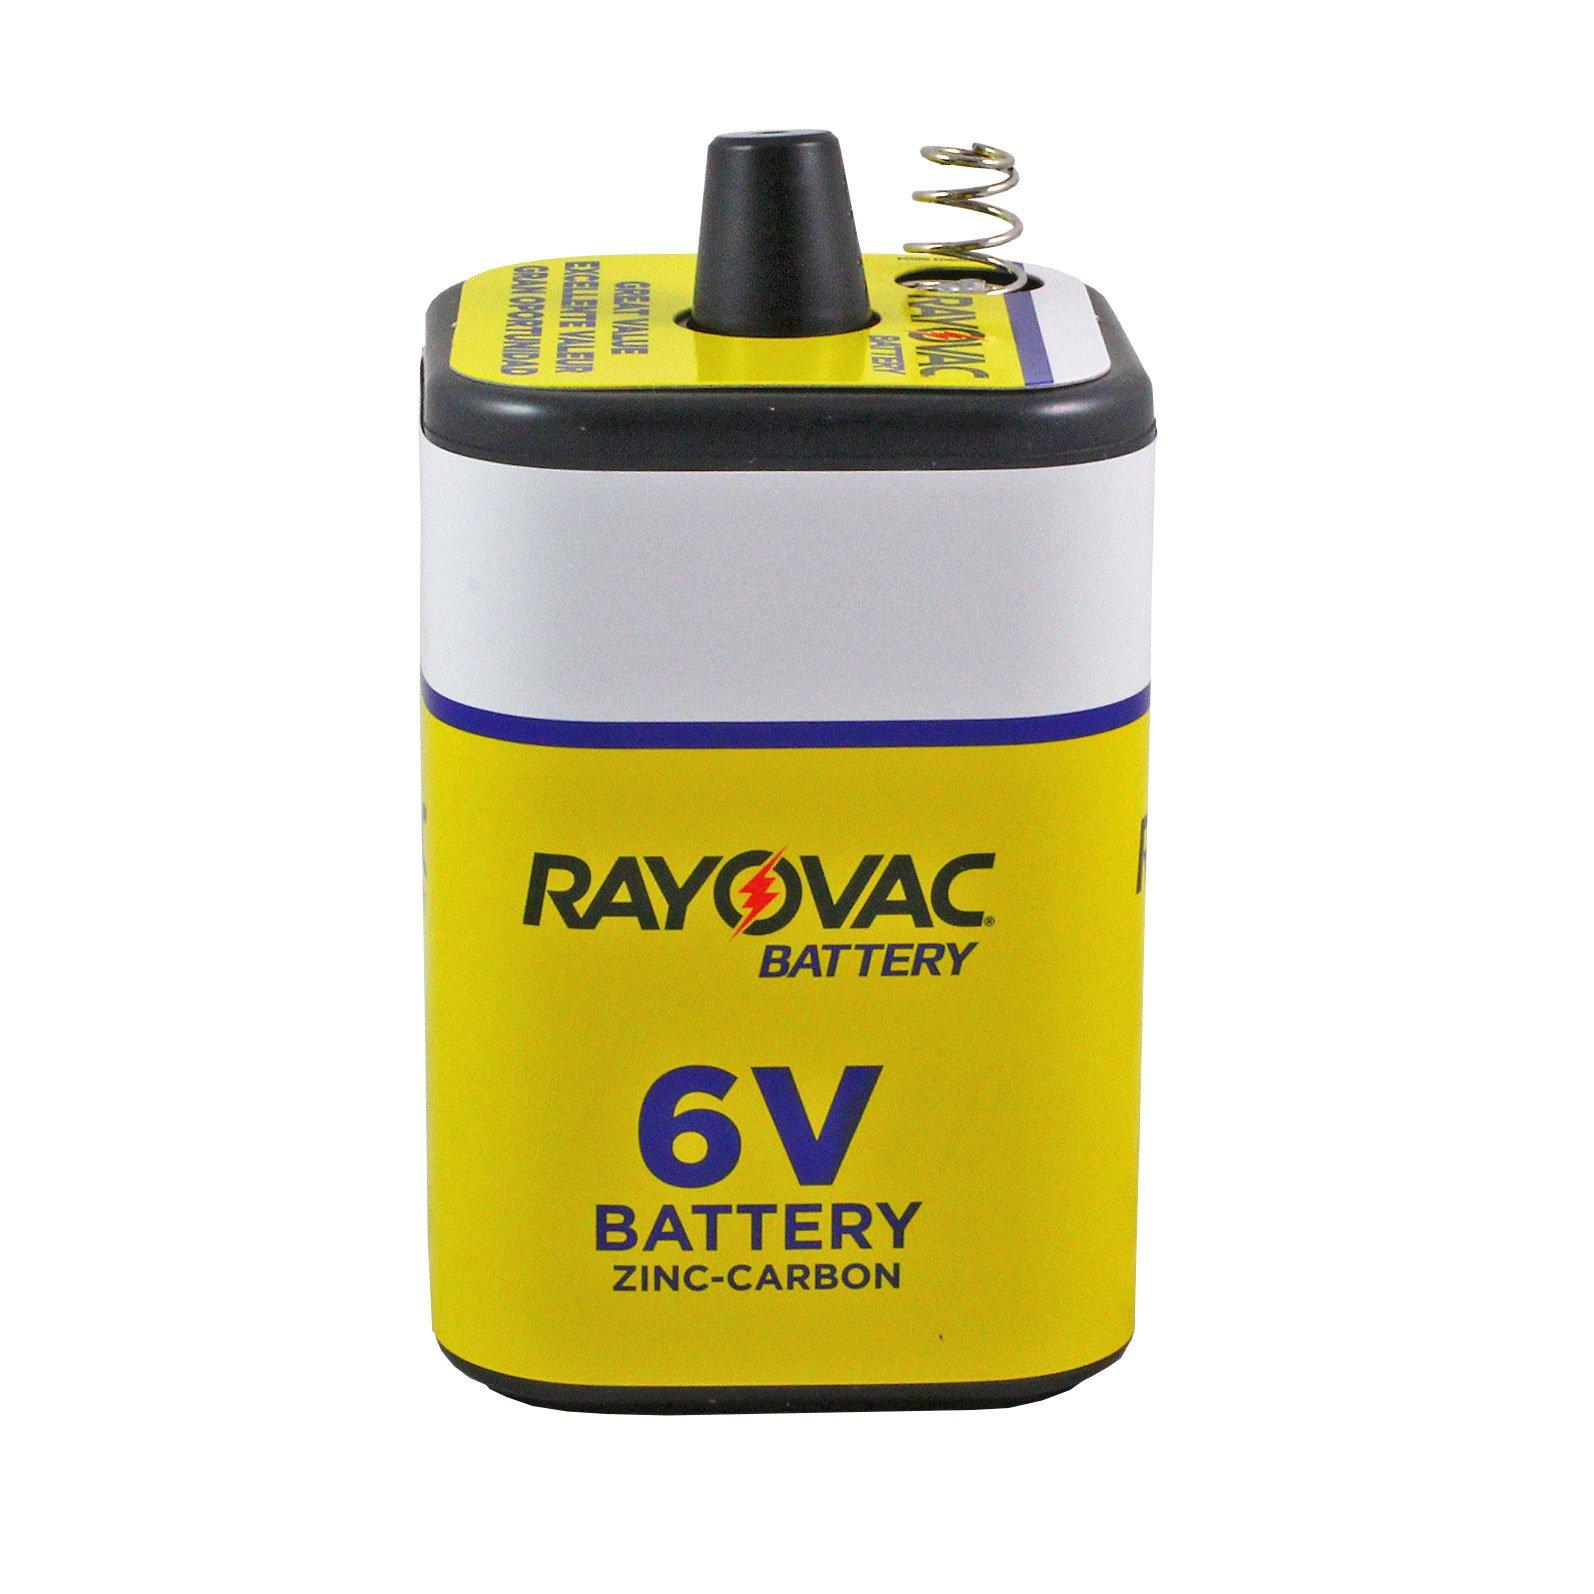 Rayovac 6v Hd 6 Volt Heavy Duty Lantern Battery Battery Mart